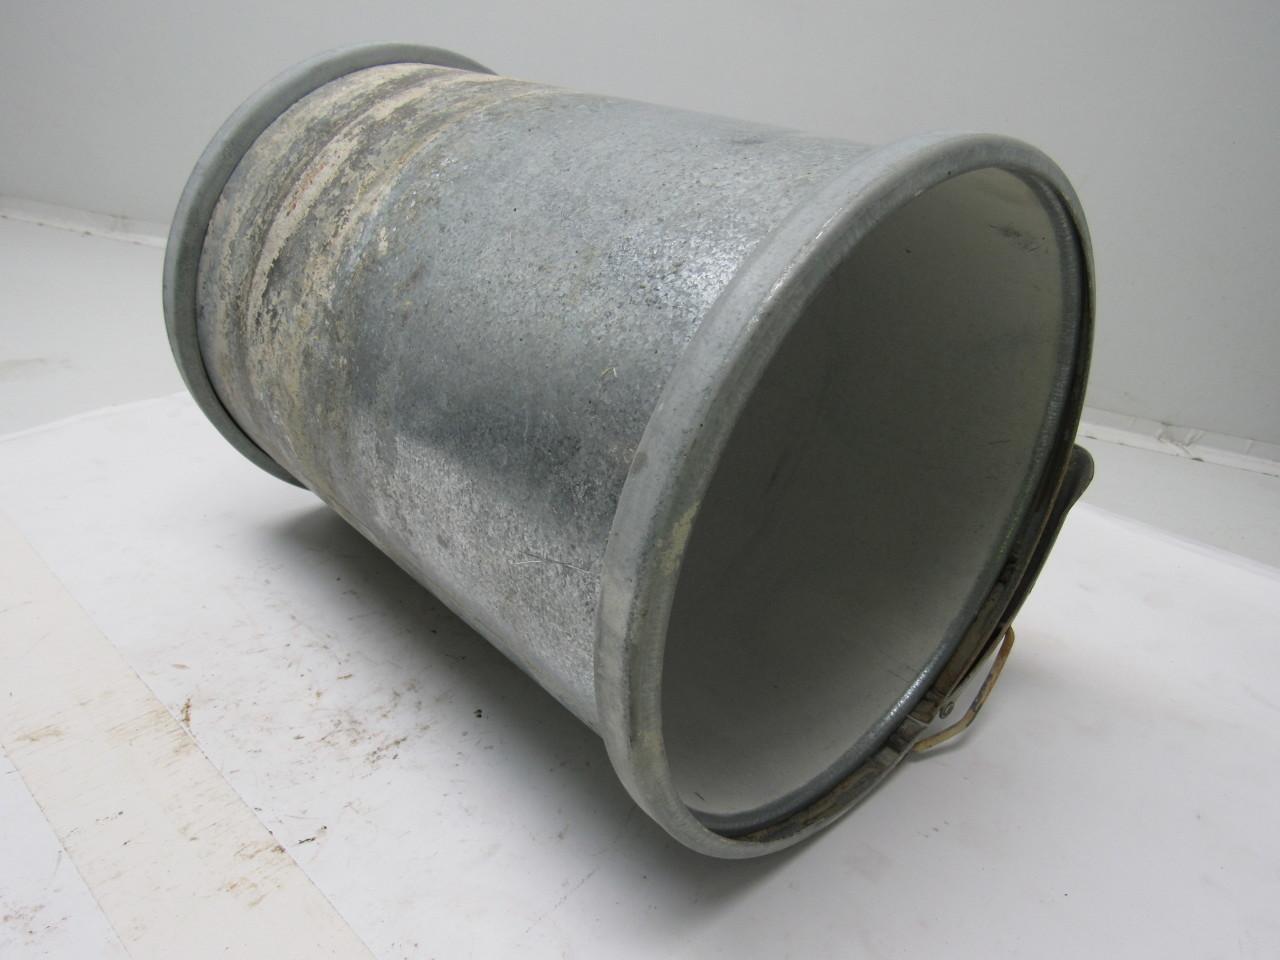 Quot galvanized industrial vacuum pipe coupling w clamps ebay